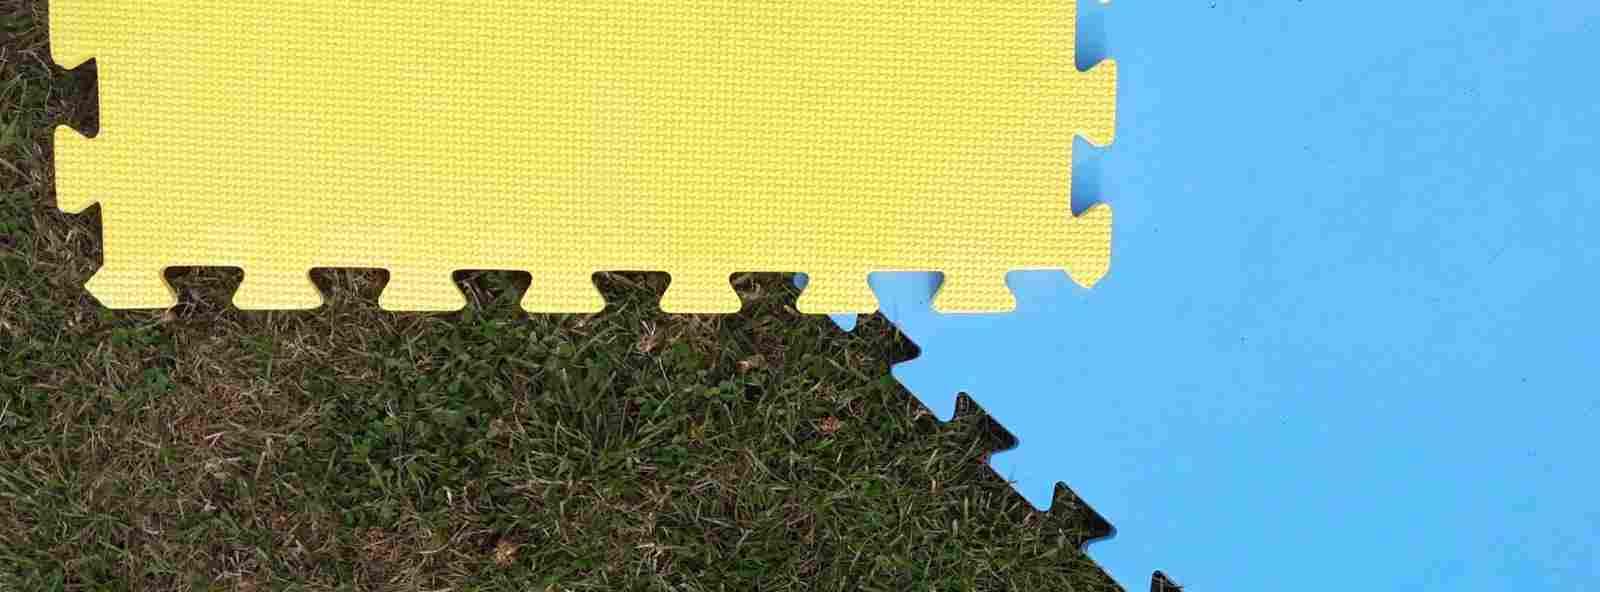 foam mats blue and yellow